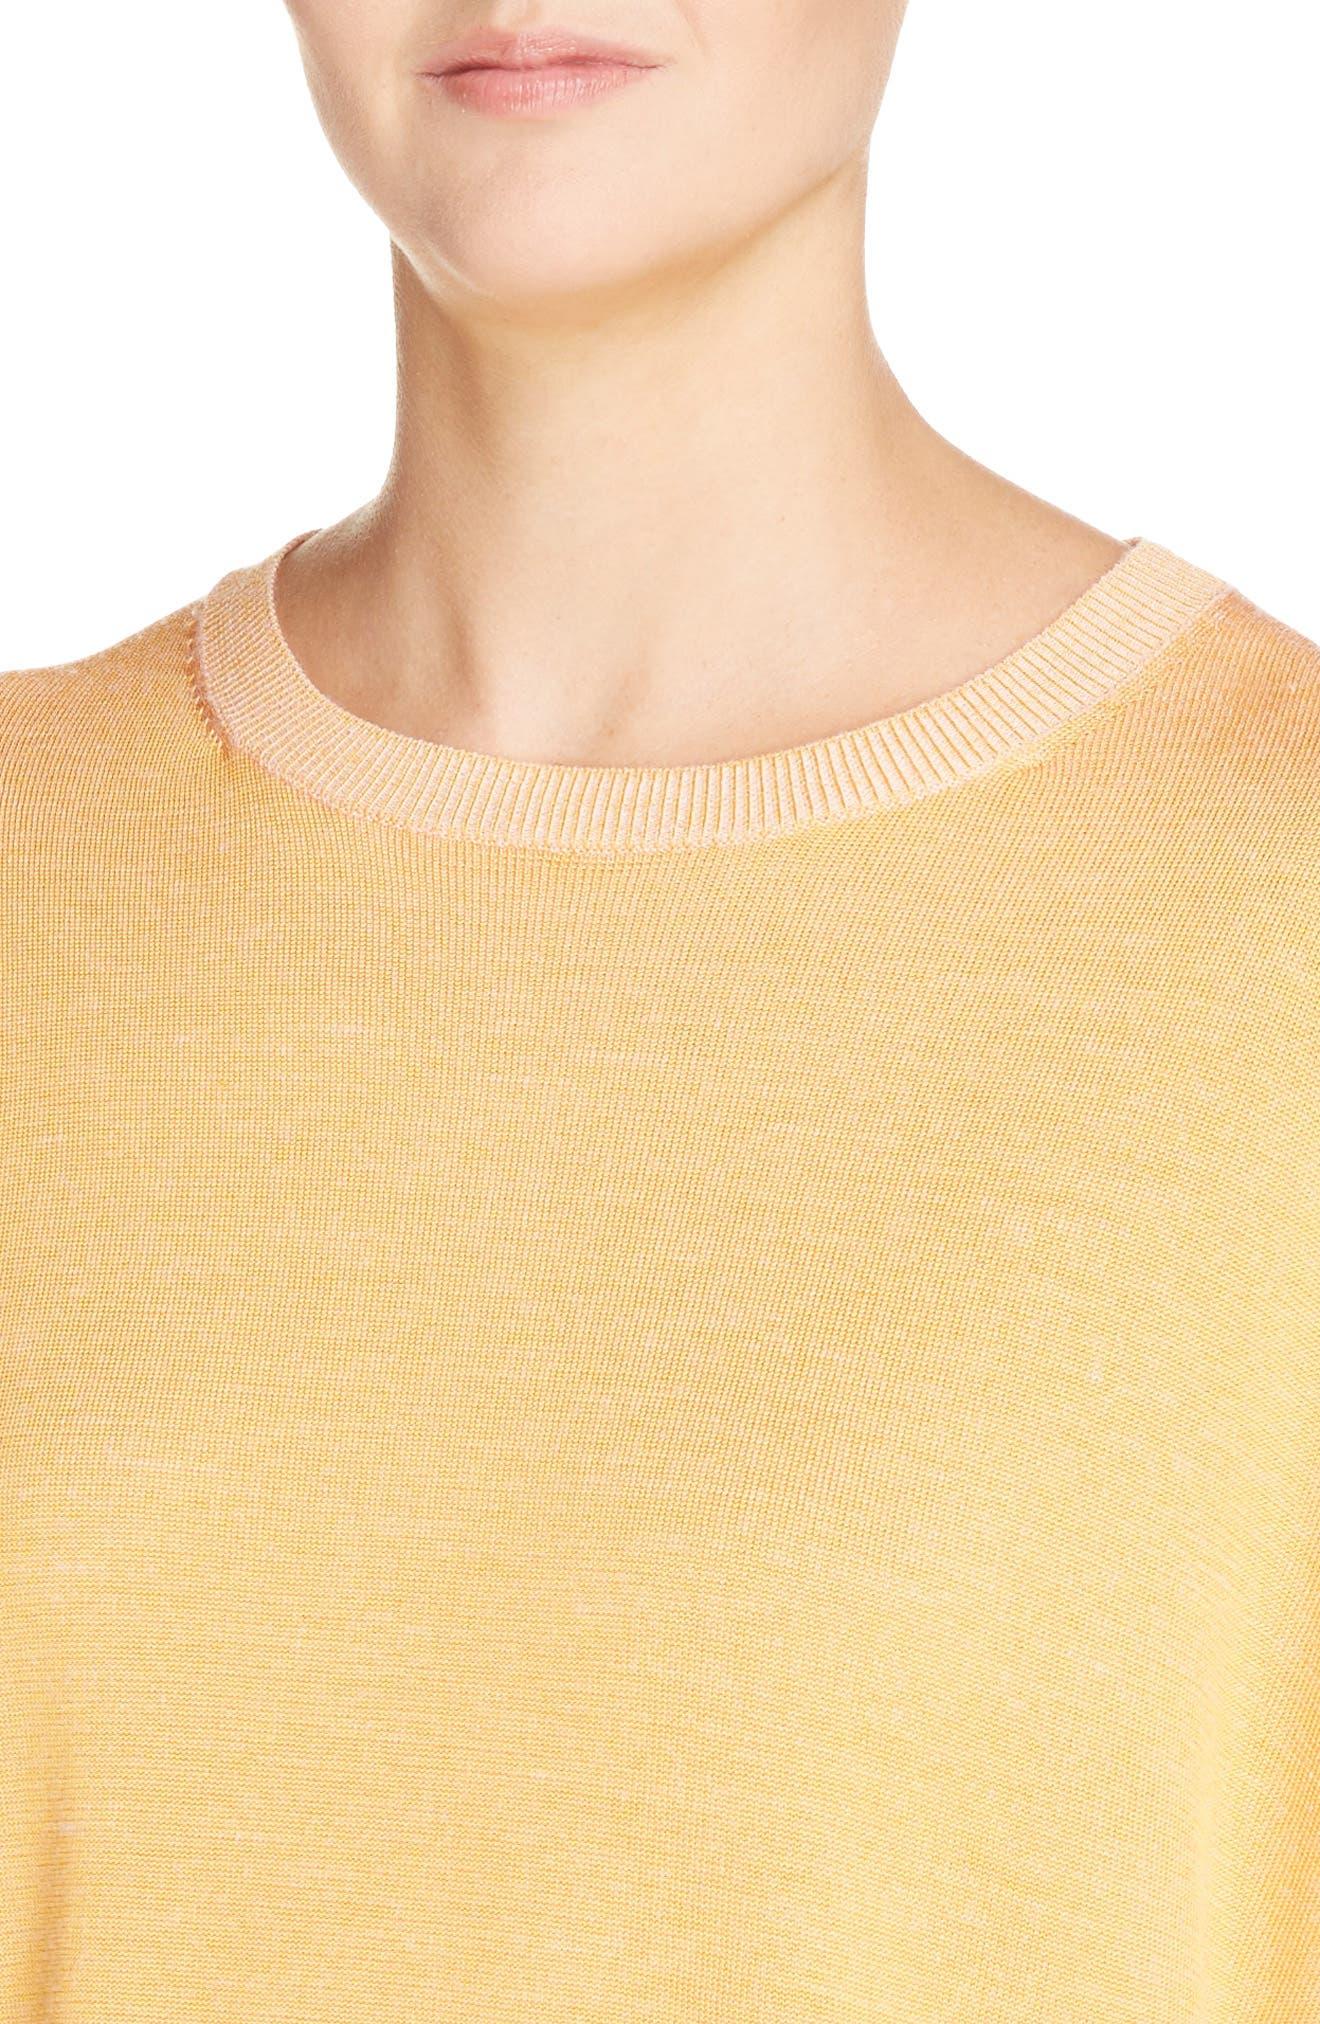 Finola 2-Tone Sweater,                             Alternate thumbnail 4, color,                             Orange